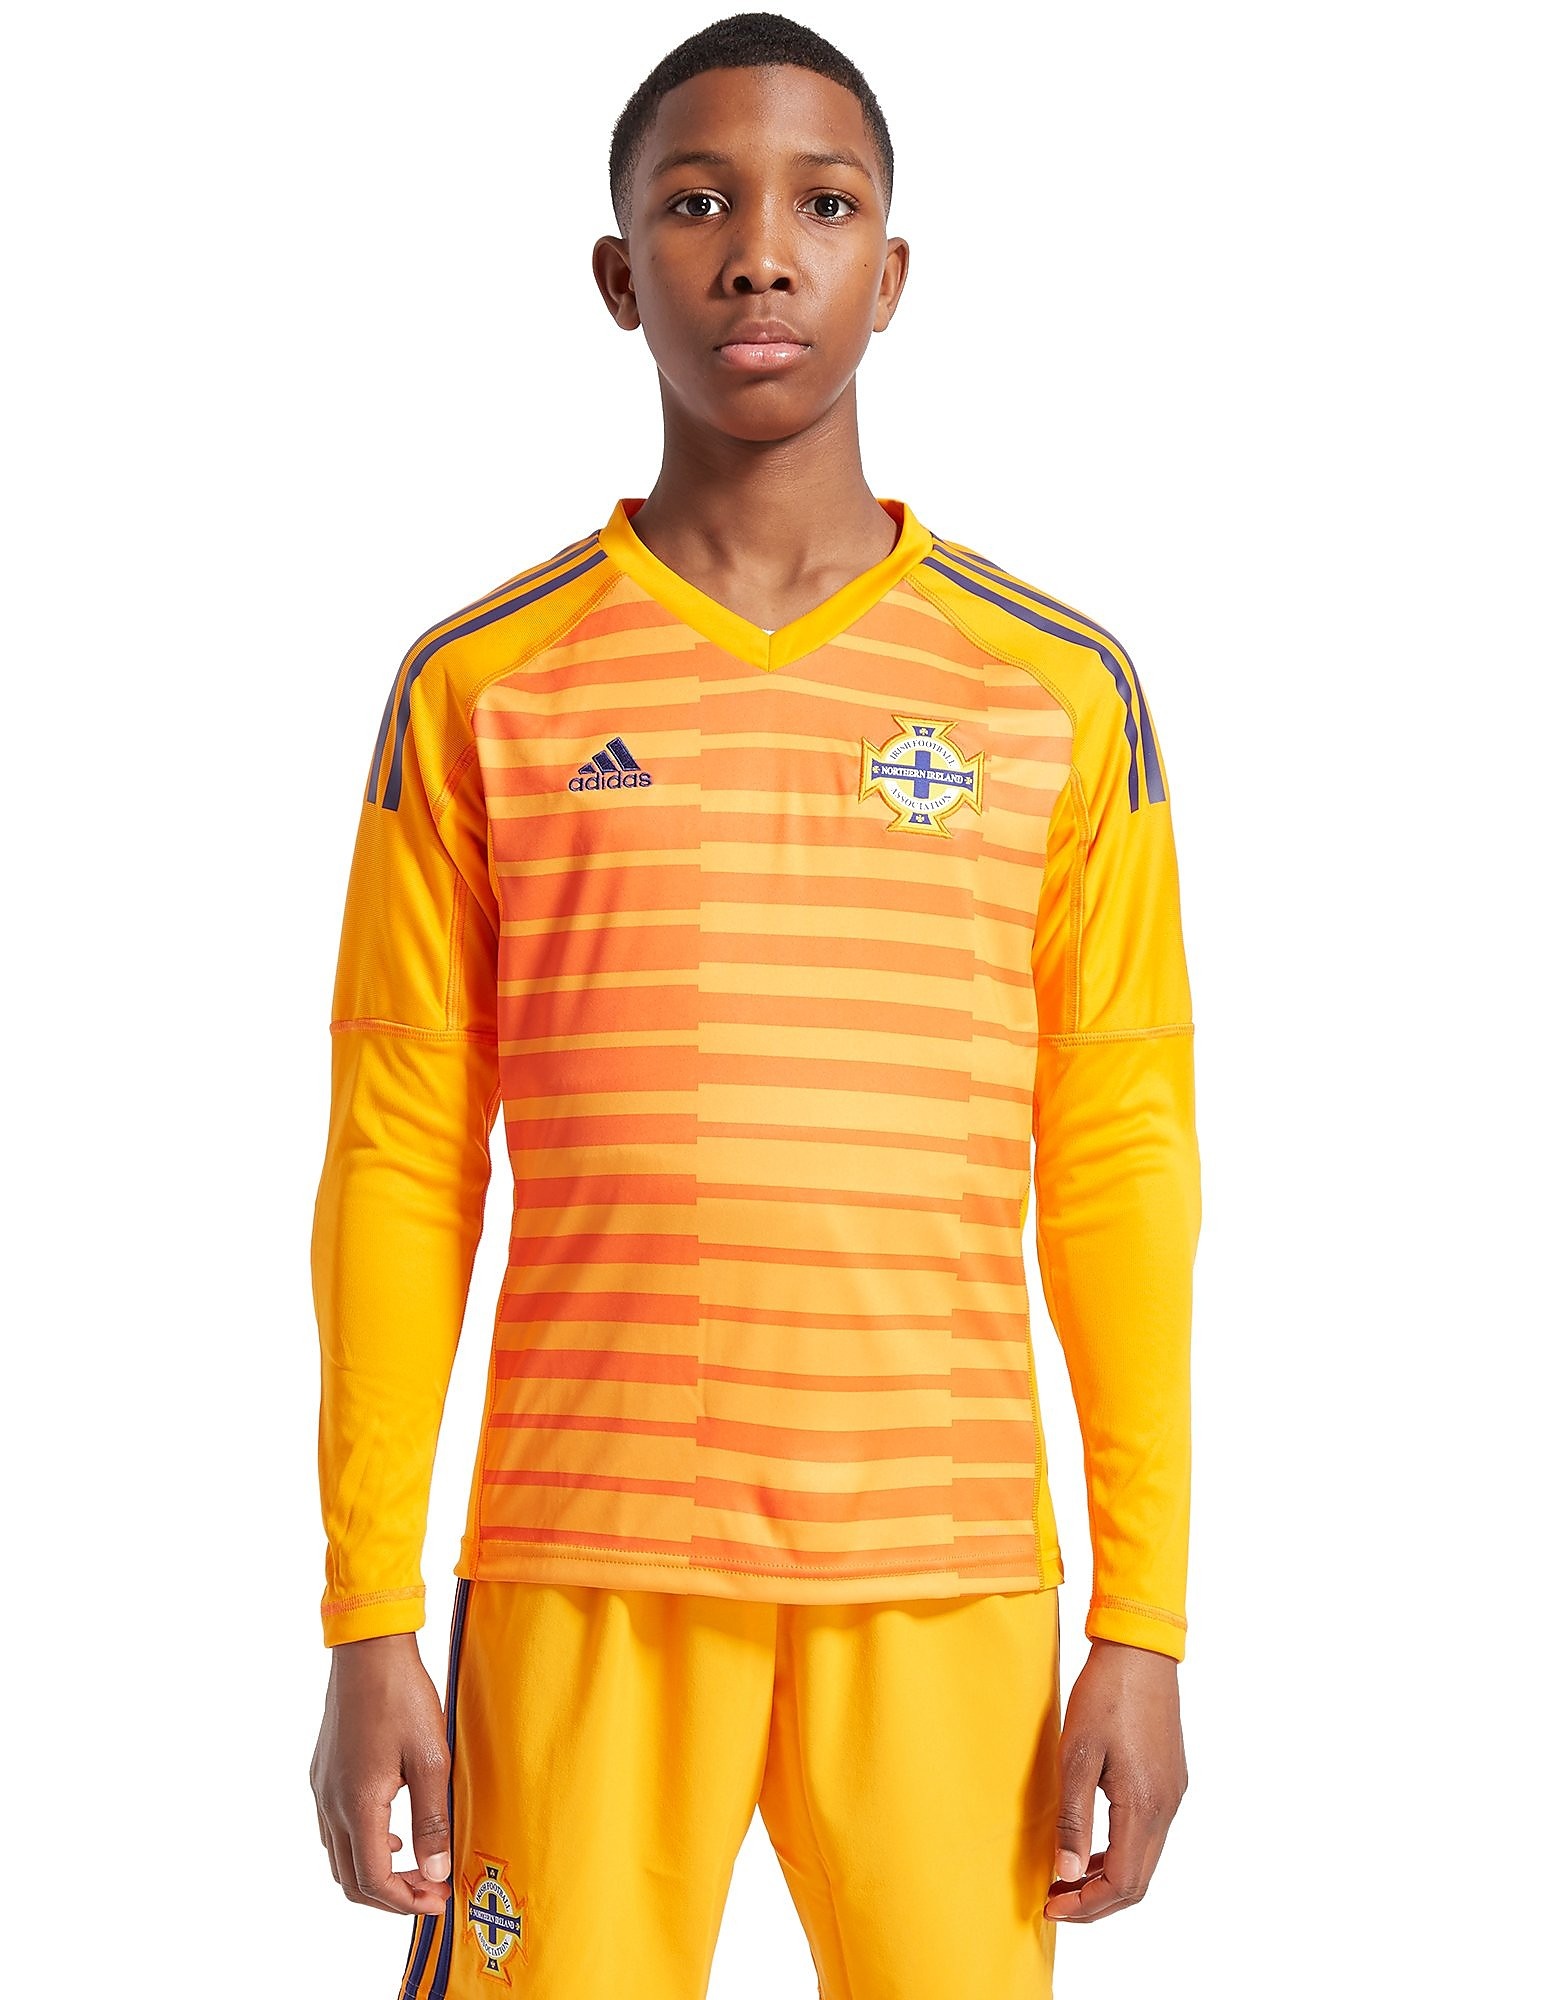 adidas Northern Ireland 2018 Home Goal Keeper Shirt Jnr